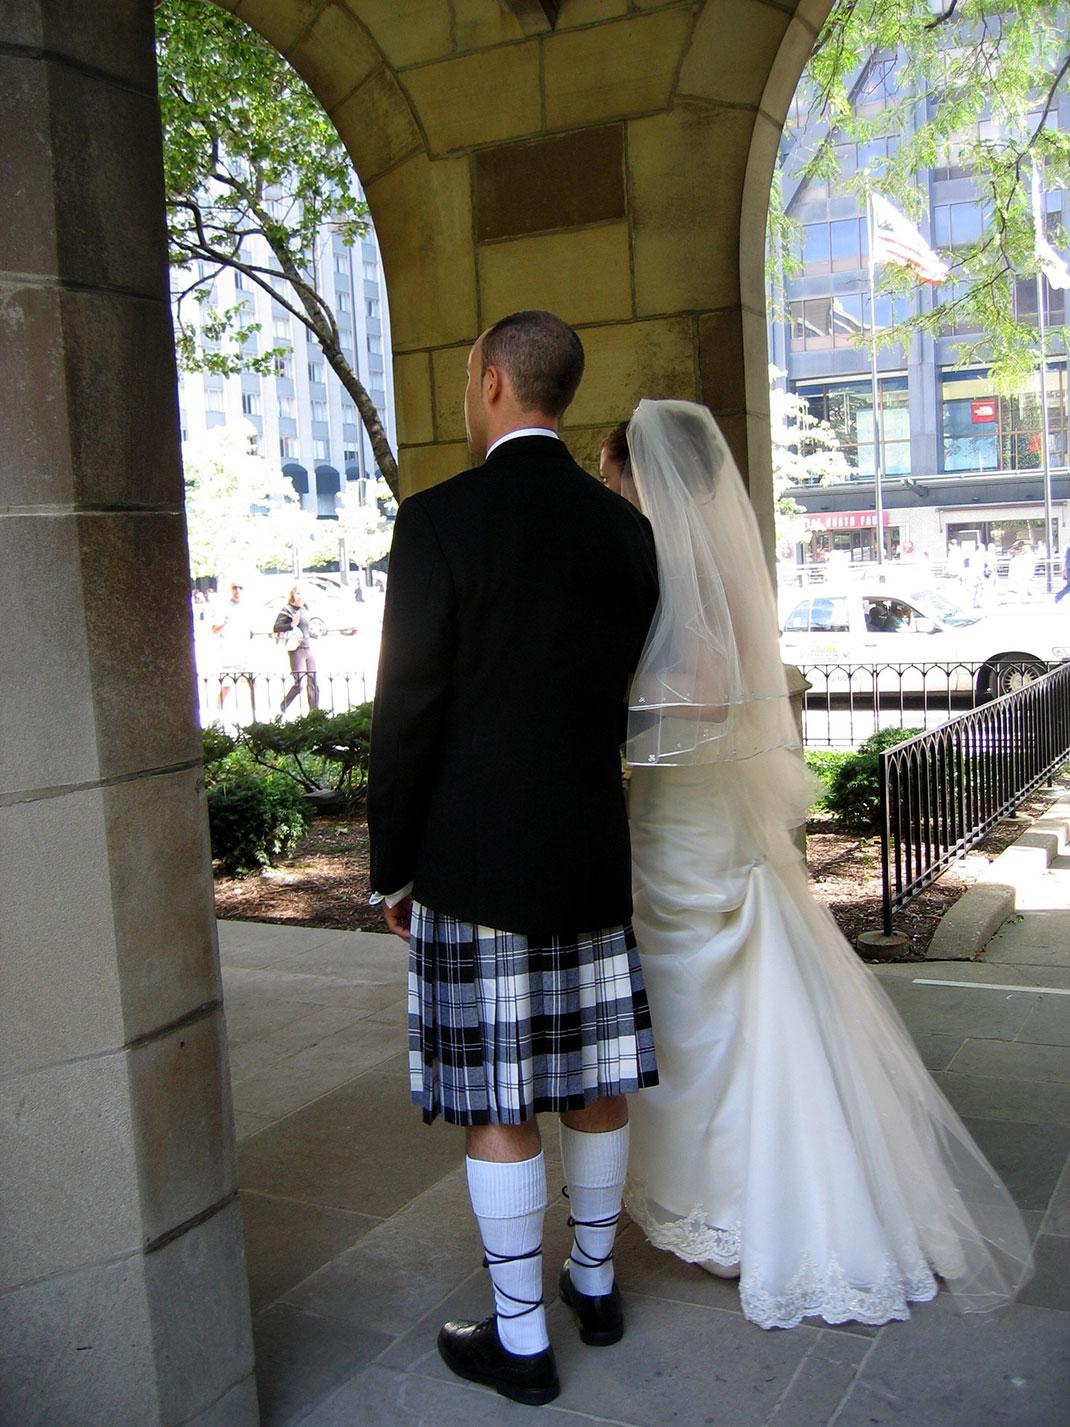 Mariage écossais via Shutterstock